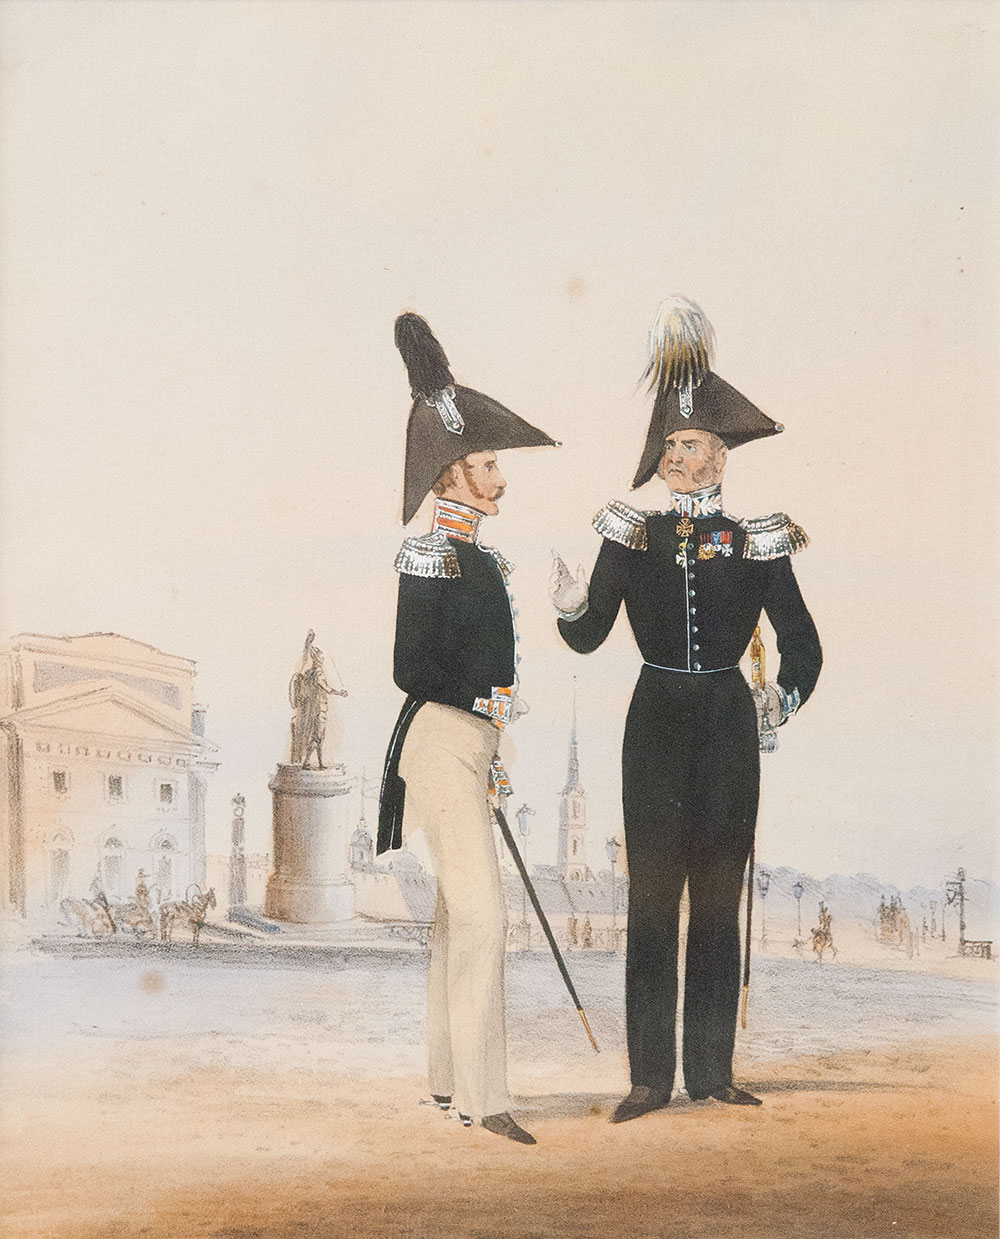 Buy Maneuvers in Tsarskoye Selo  Russia Uniforms of the Imperial